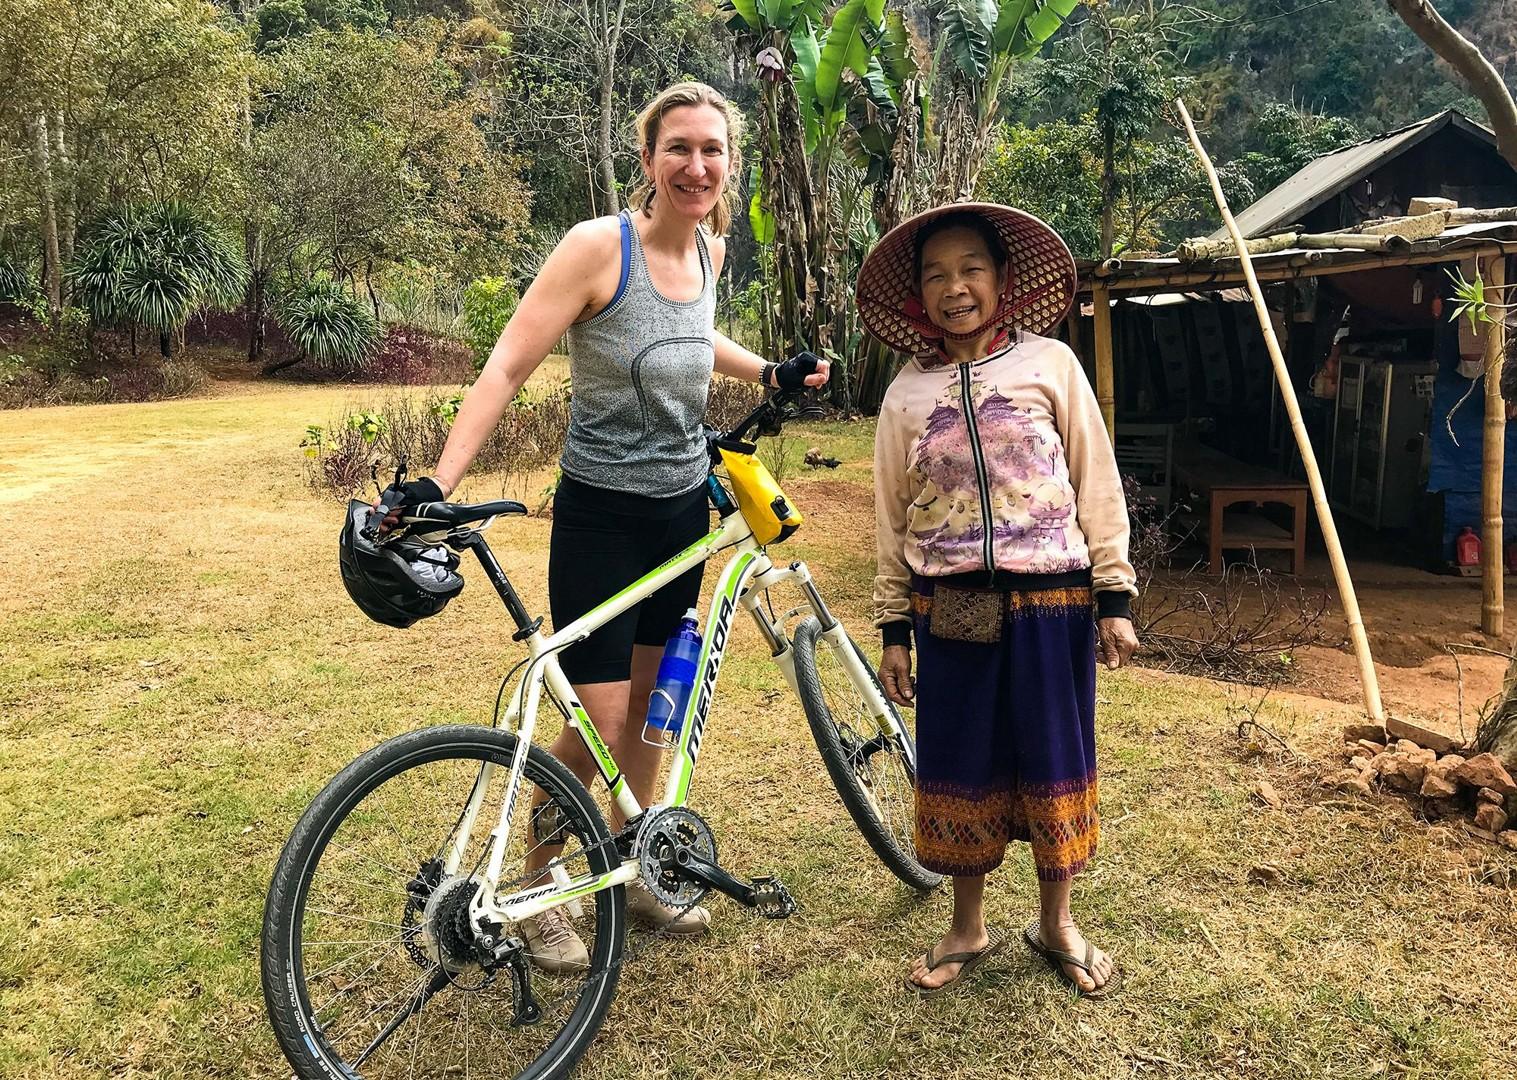 IMG_5155.jpg - Laos - Hidden Treasures - Cycling Adventures